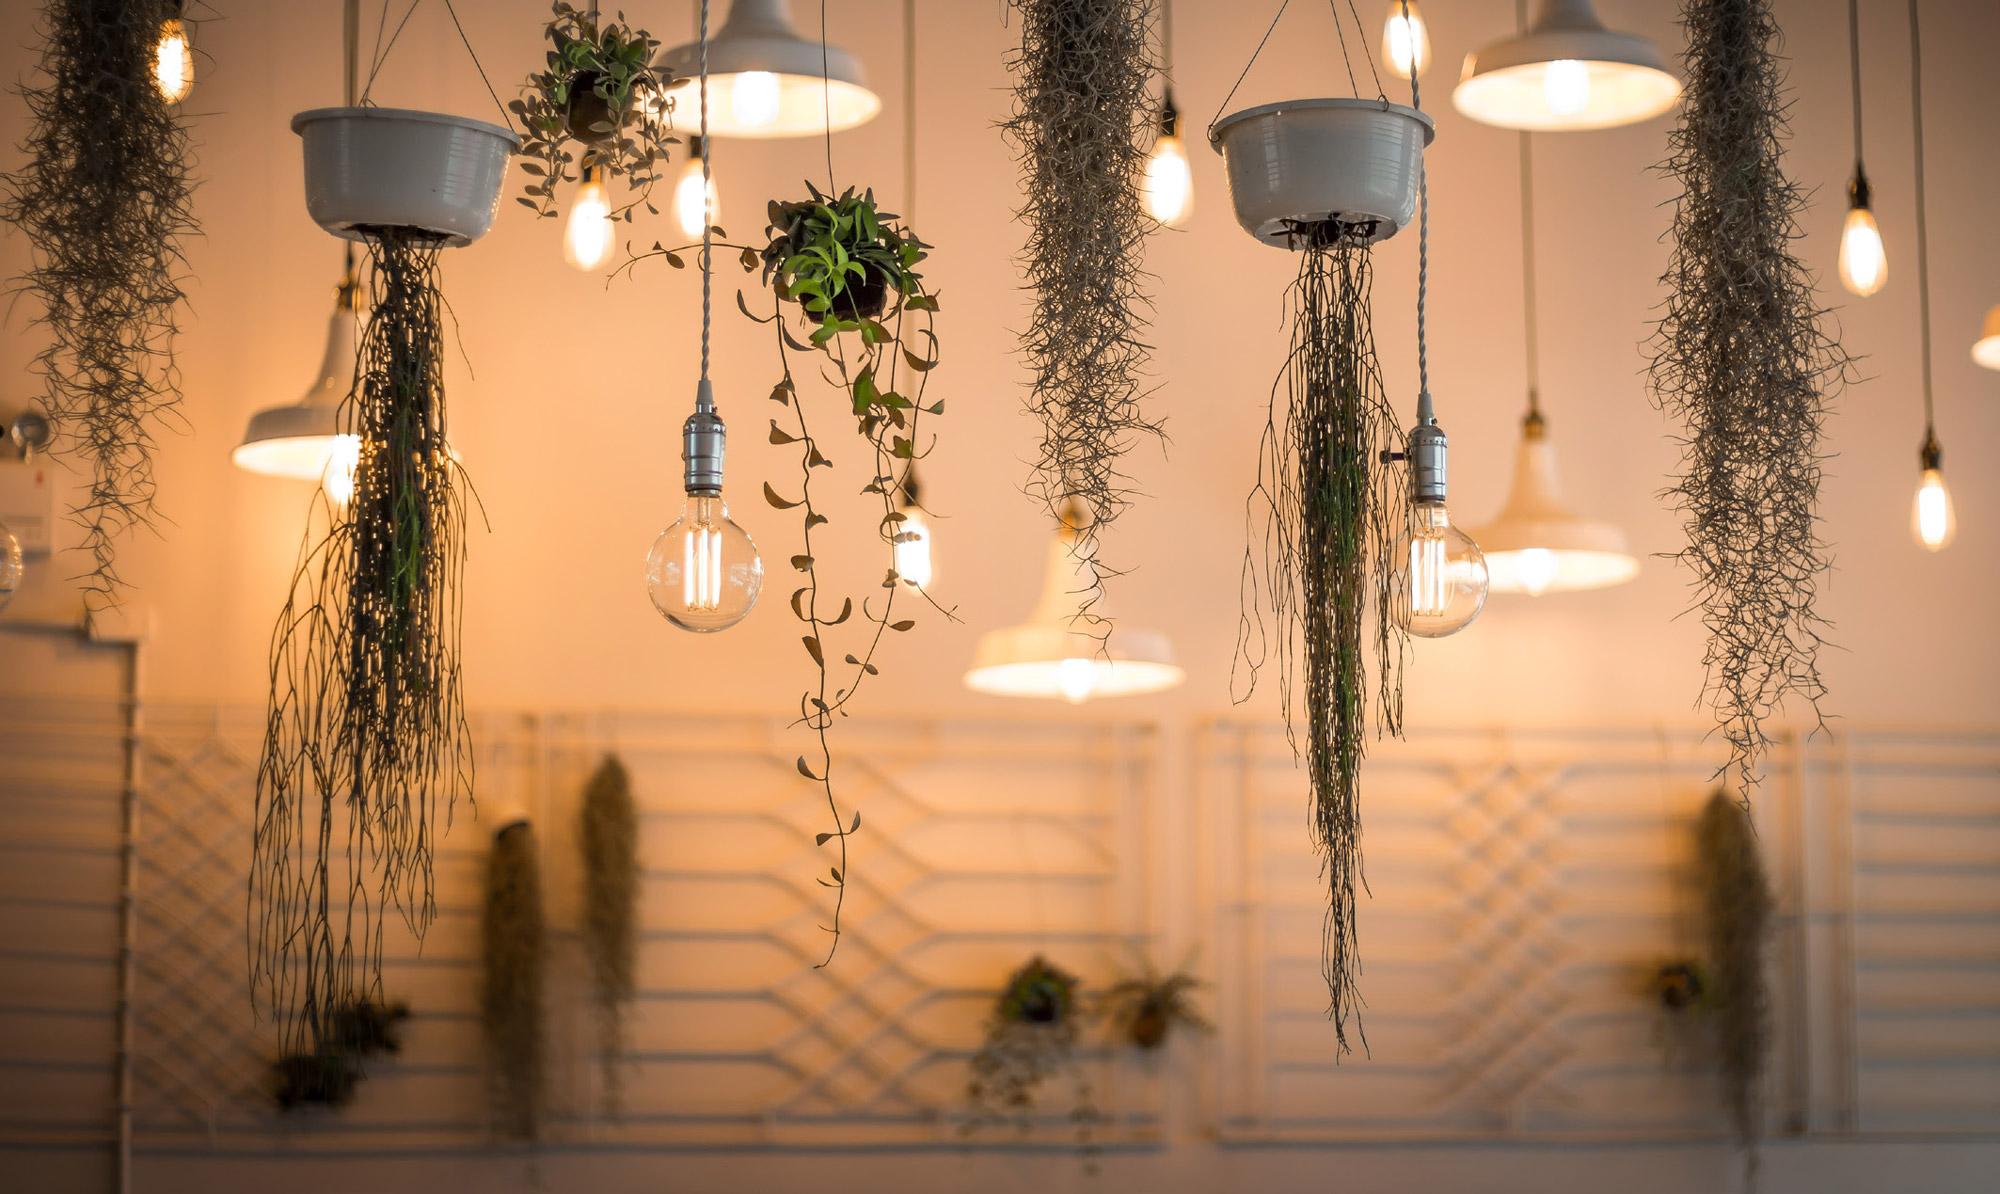 Greener lighting solution, British Independent Retailers Association